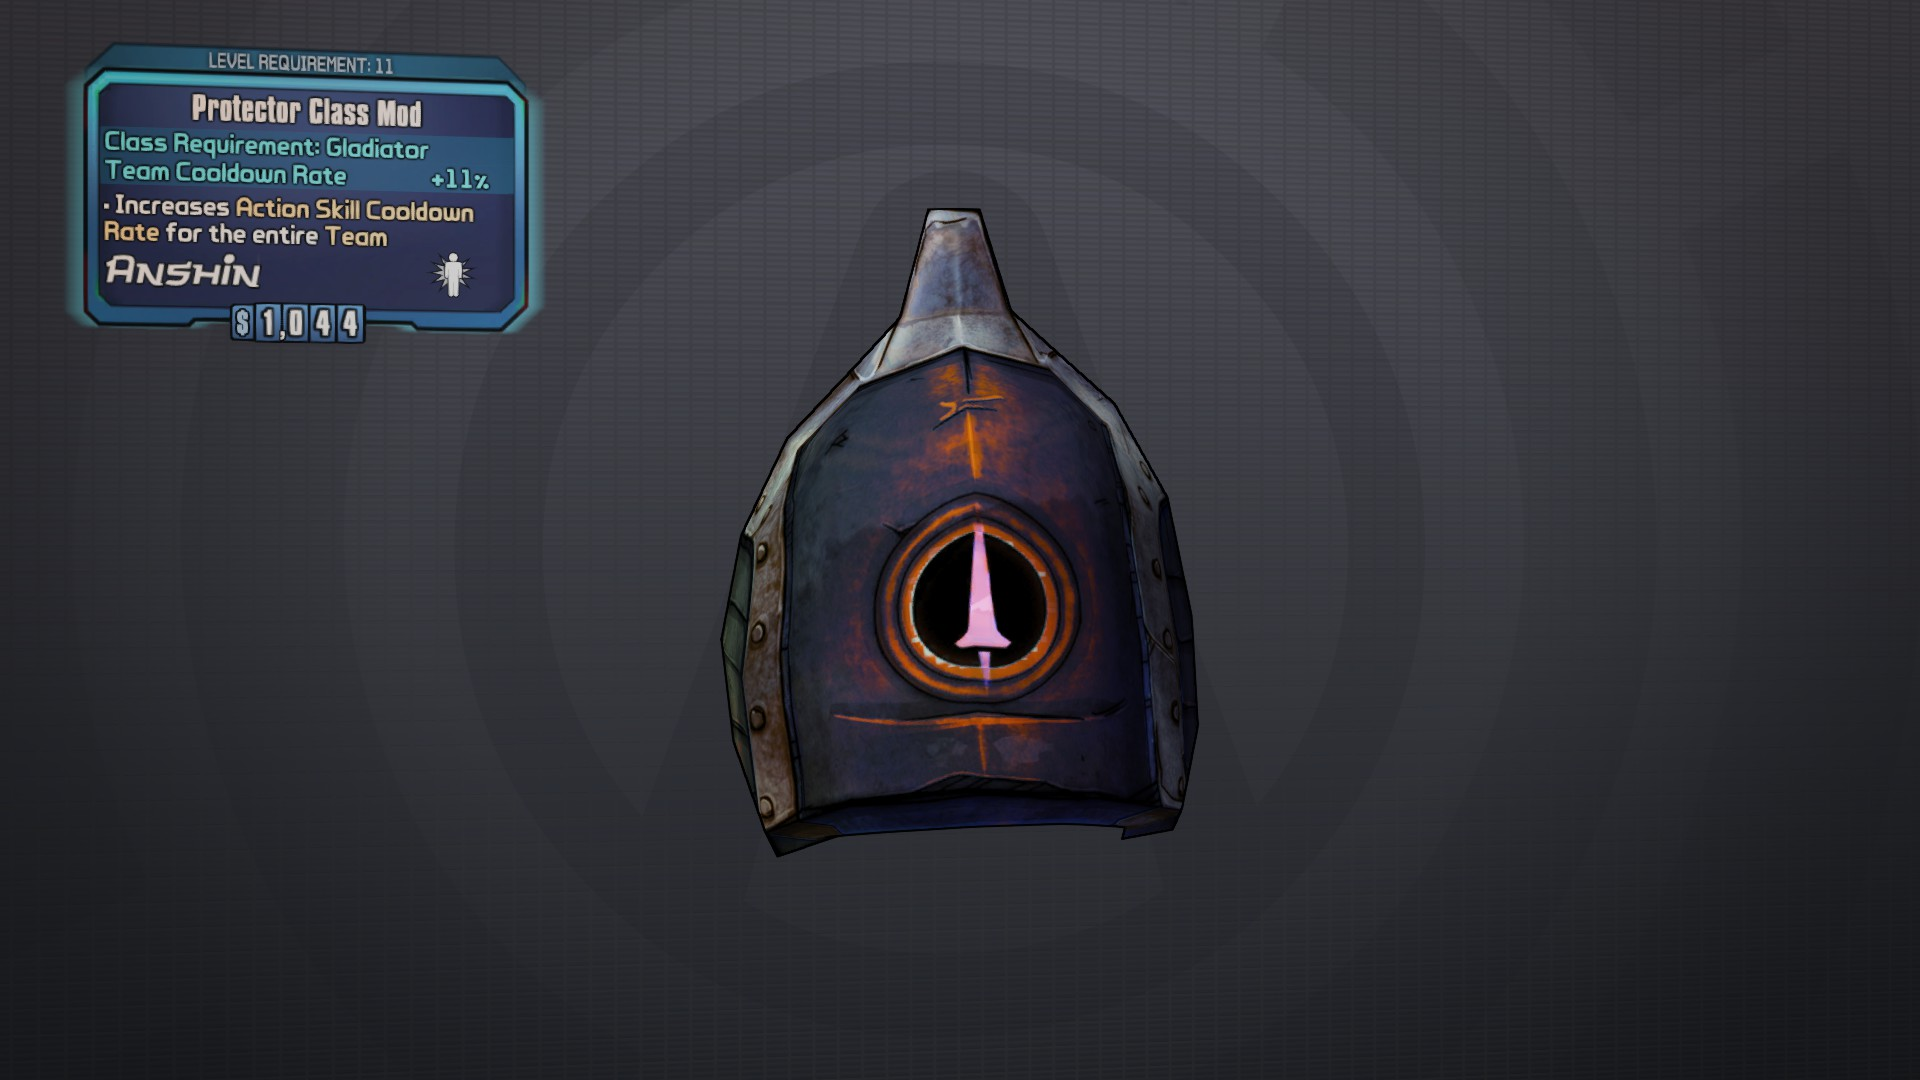 Protector (class mod)